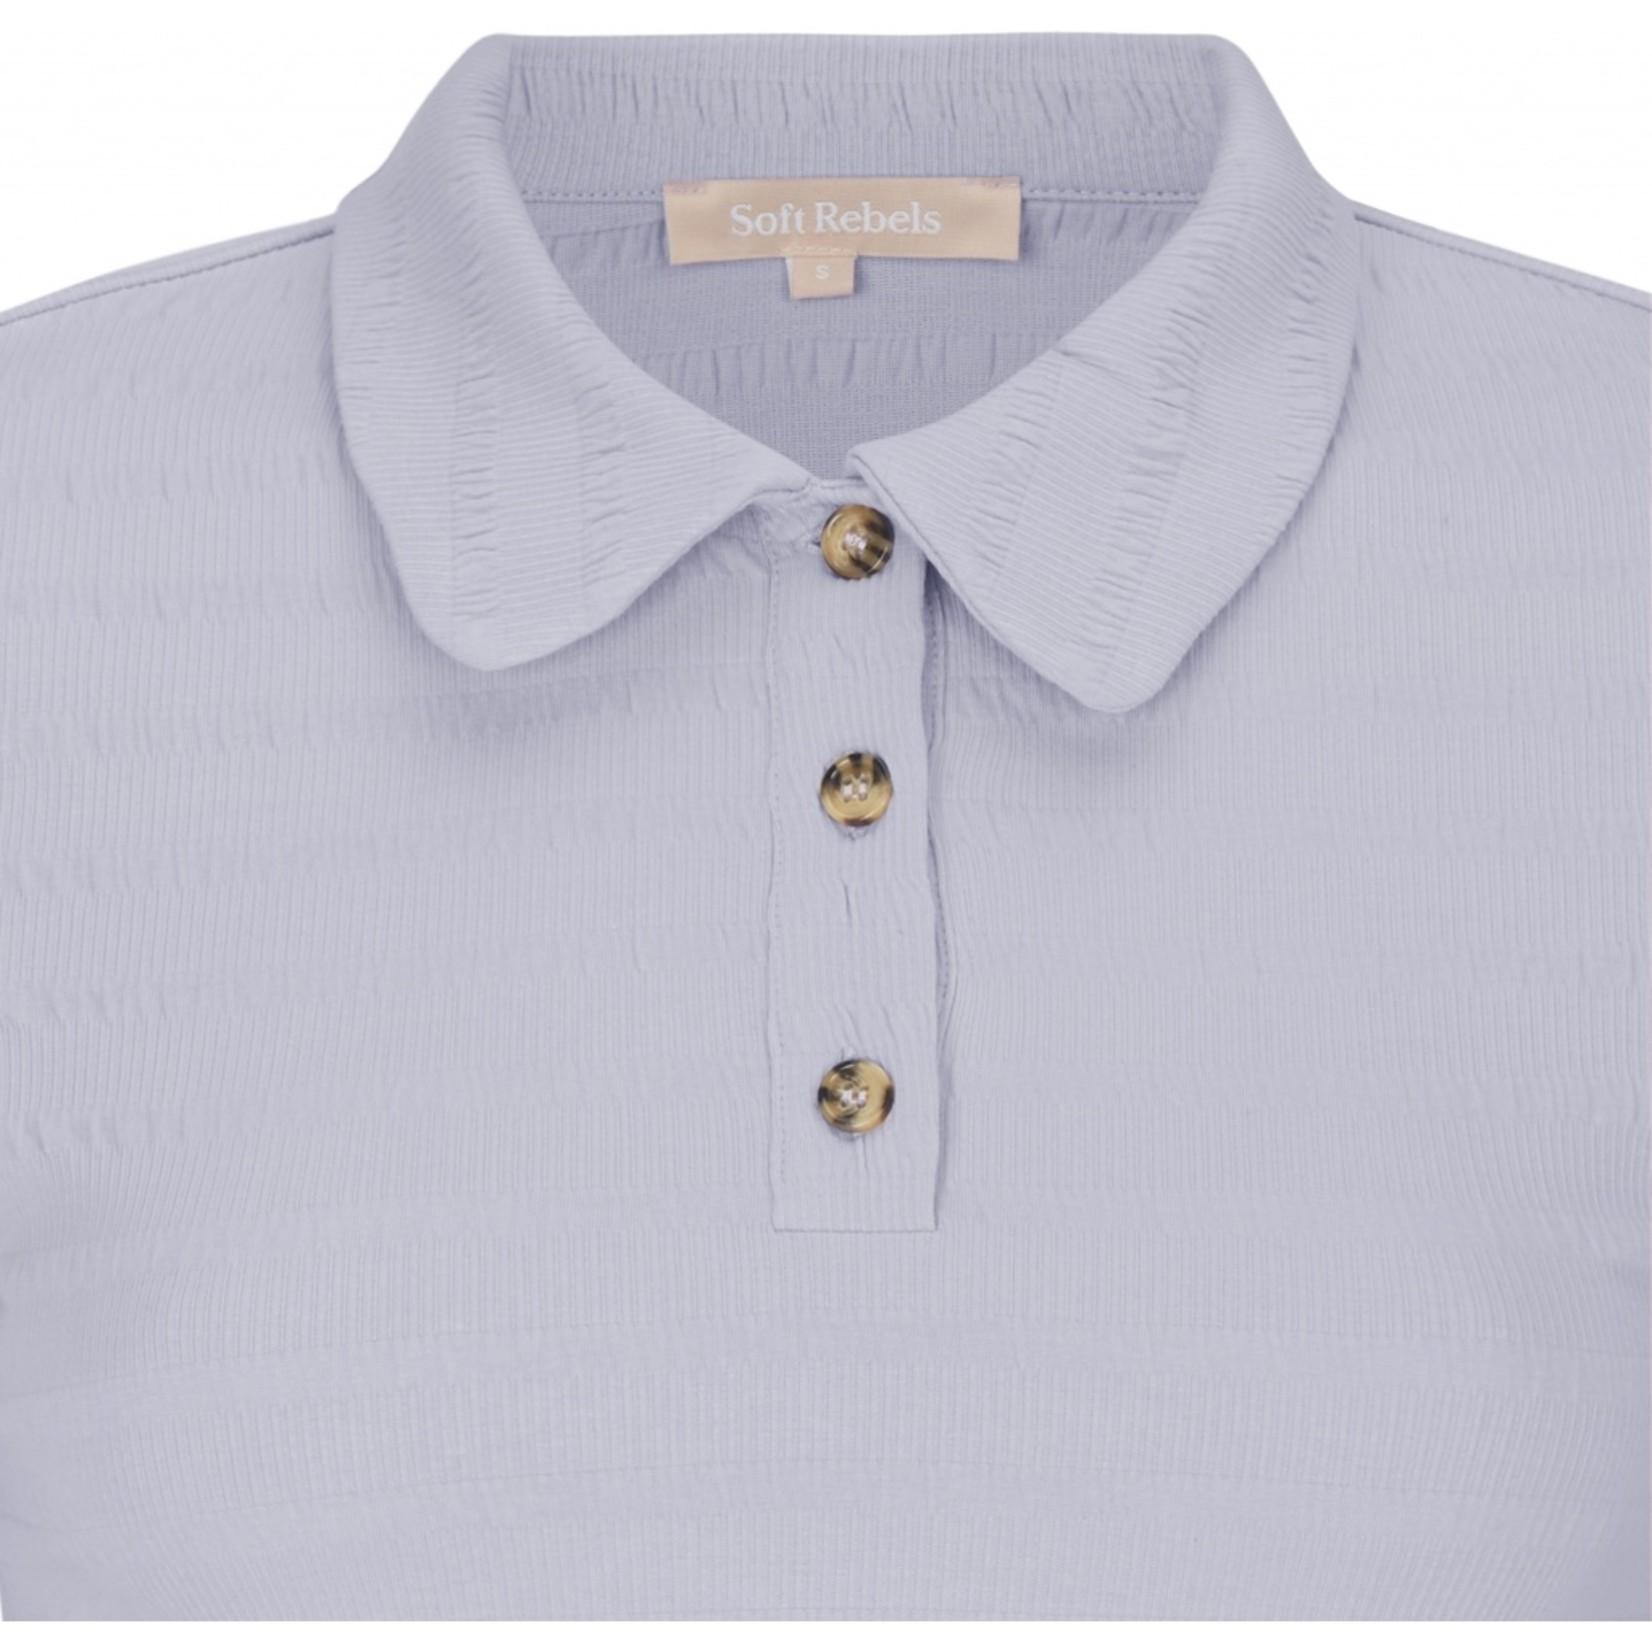 SOFT REBELS SSOphelia SS t-shirt